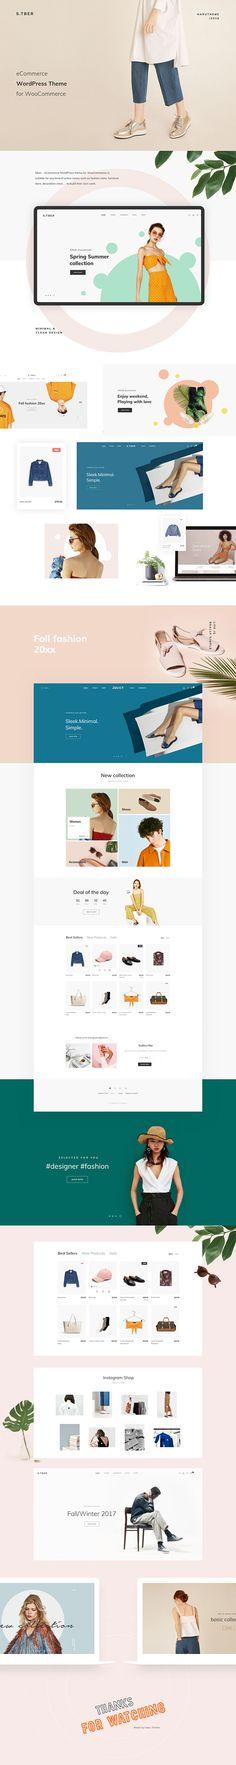 Stber - eCommerce WordPress theme on Behance